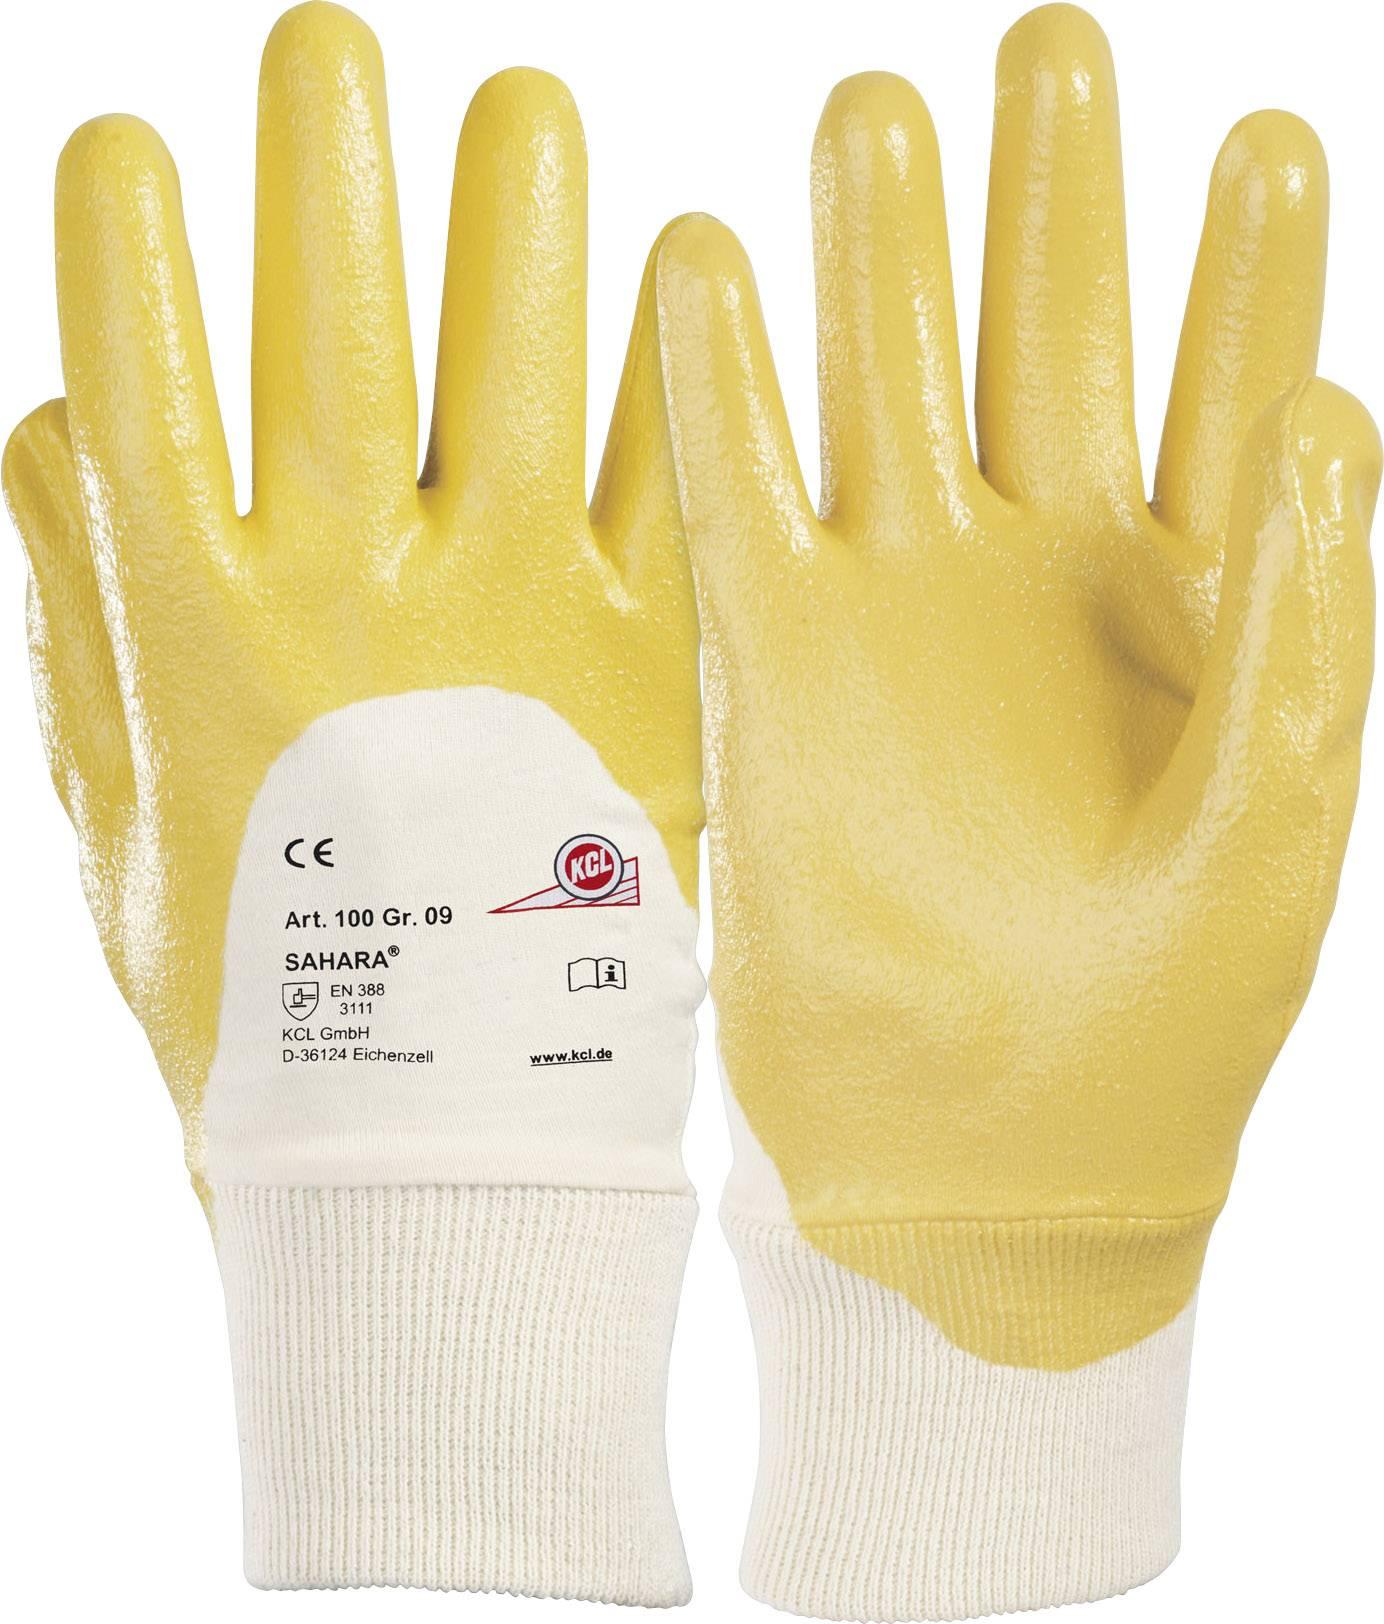 Pracovné rukavice KCL Sahara® 100, velikost rukavic: 9, L